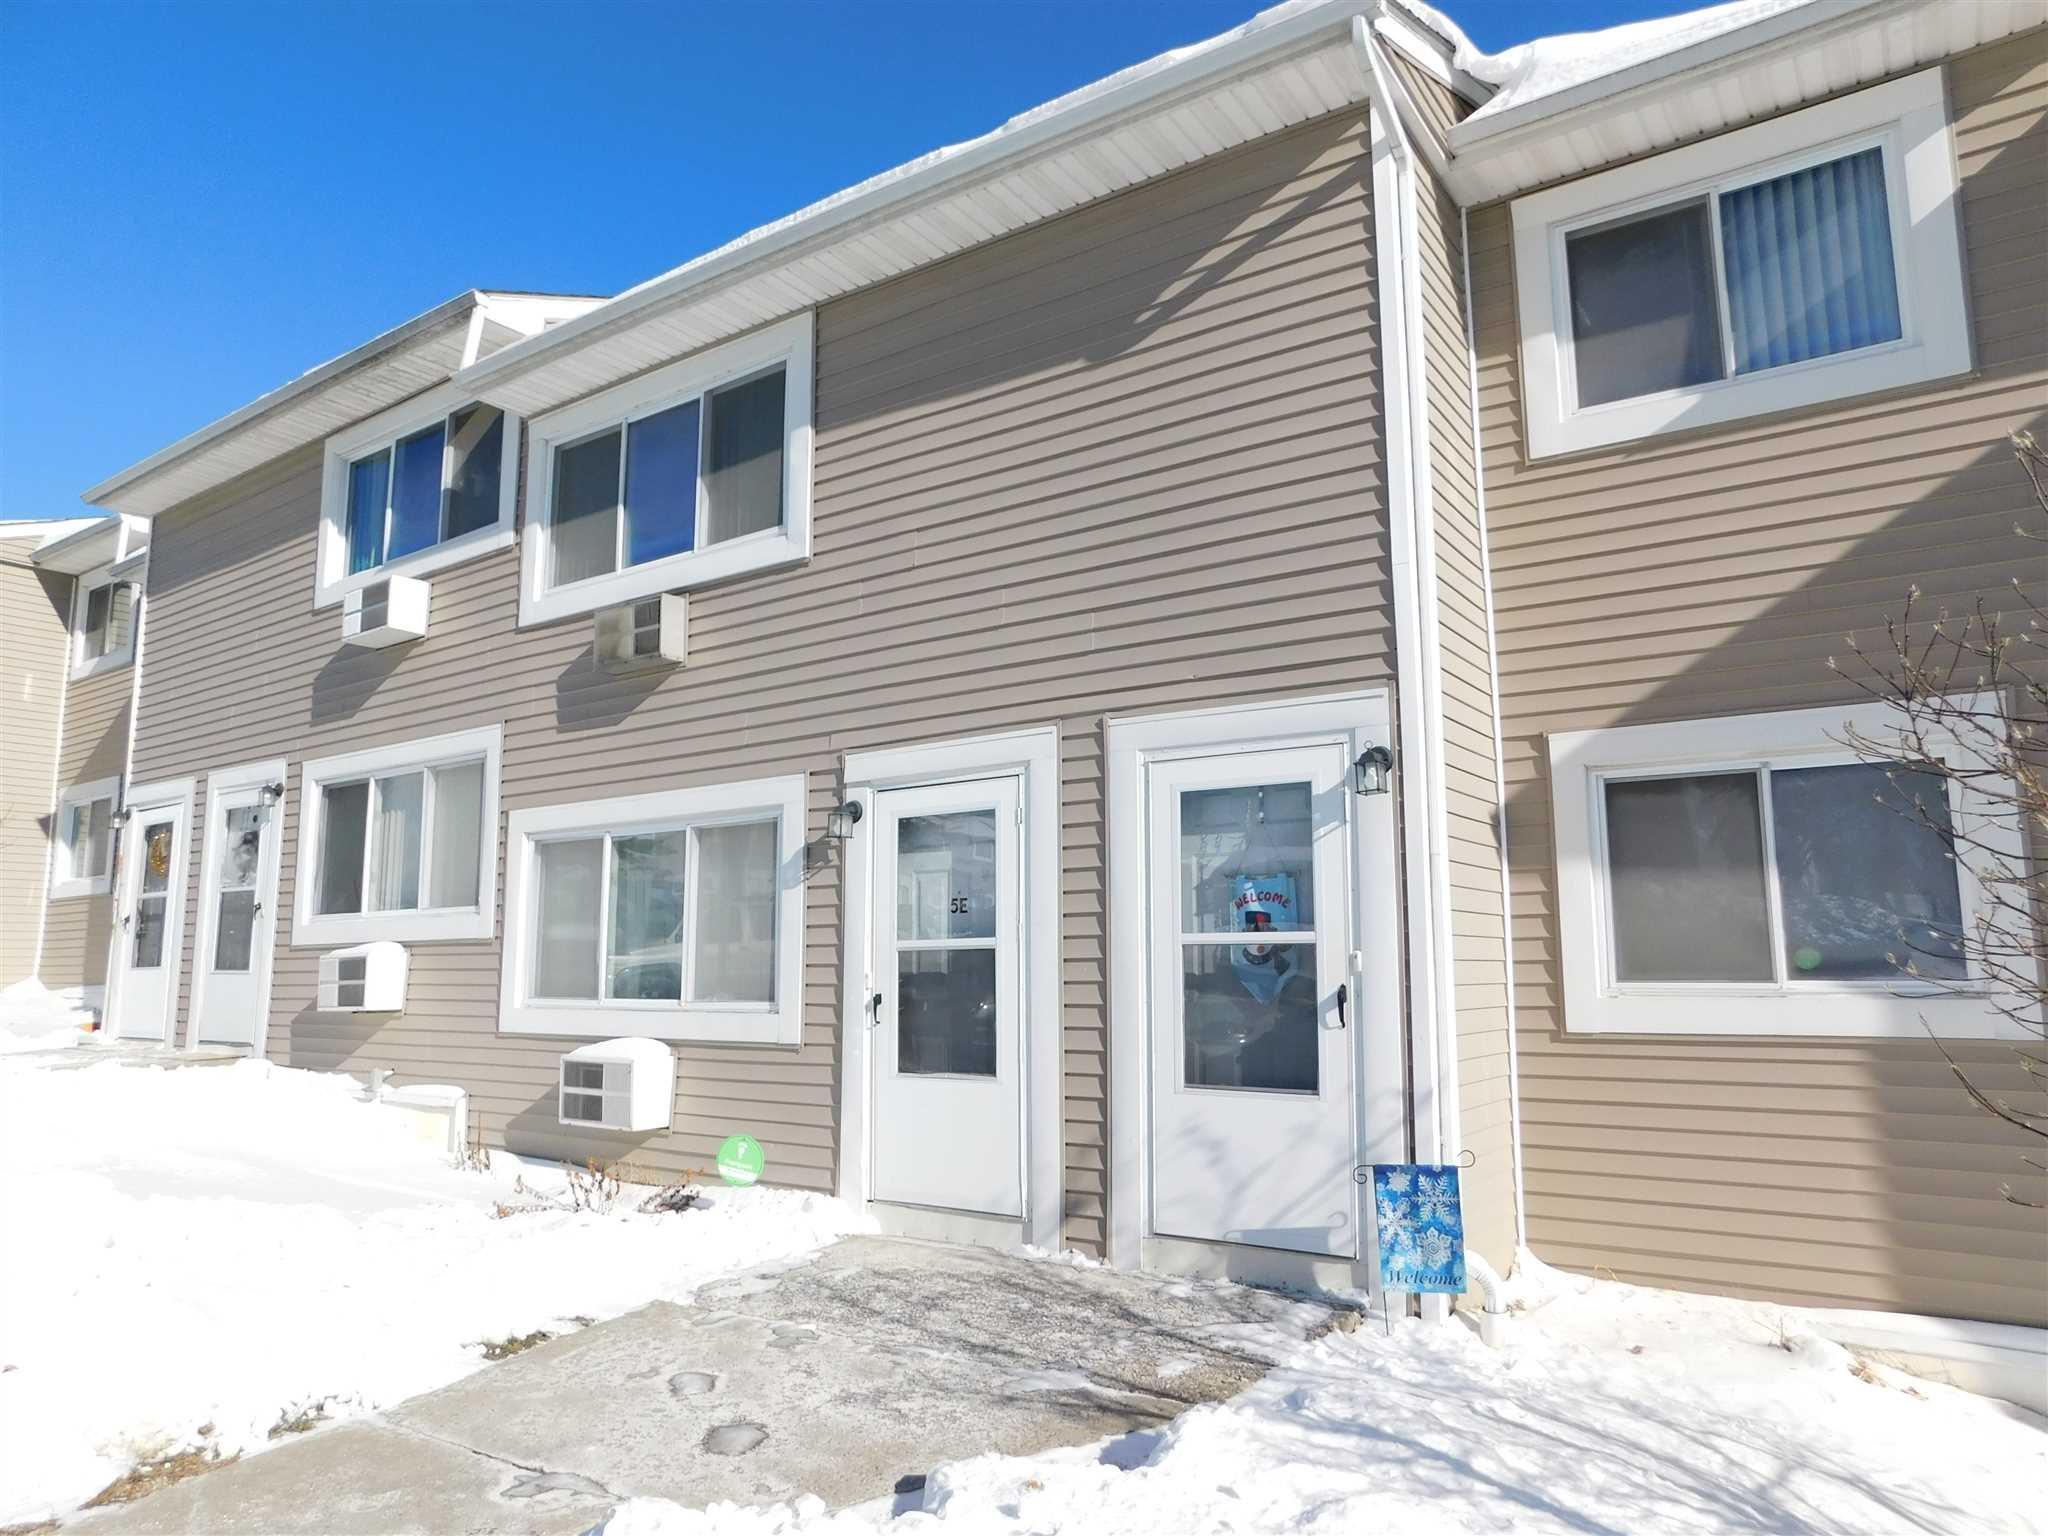 Single Family Home for Sale at 5 FISHKILL GLEN 5 FISHKILL GLEN Fishkill, New York 12524 United States